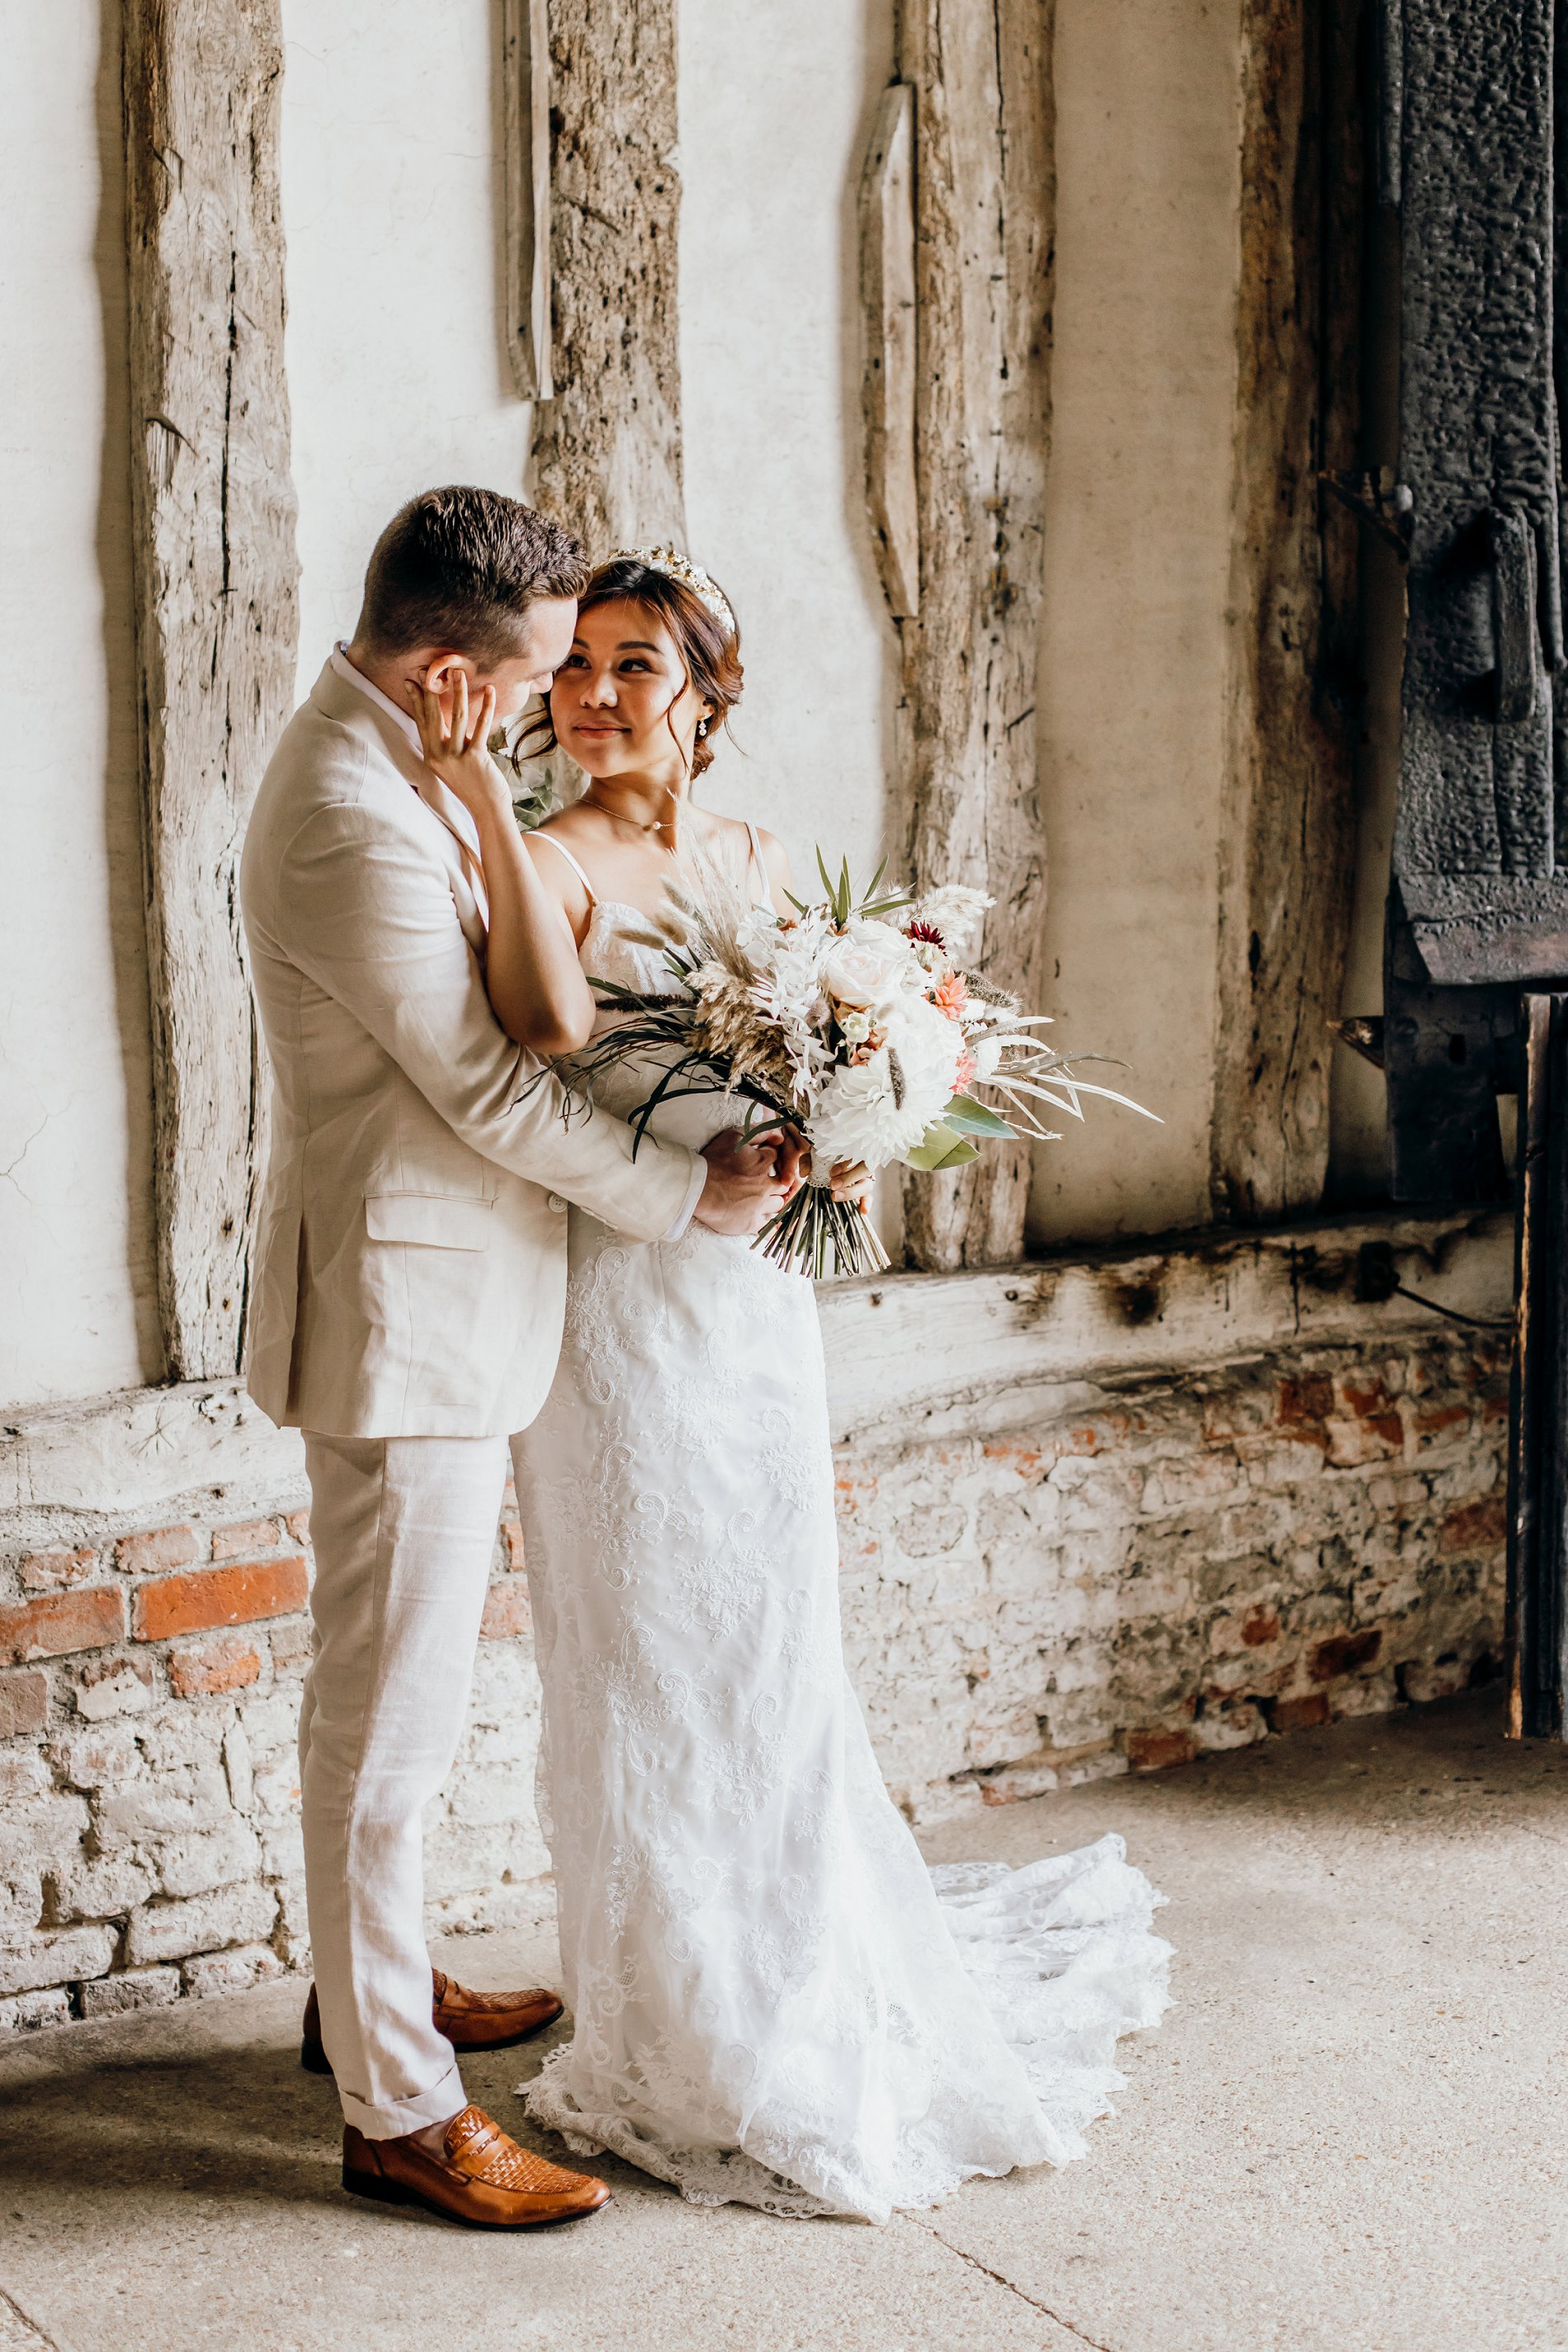 A Golden Boho Wedding Shoot at Cressing Temple Barns (c) Kate Boston Photography (12)